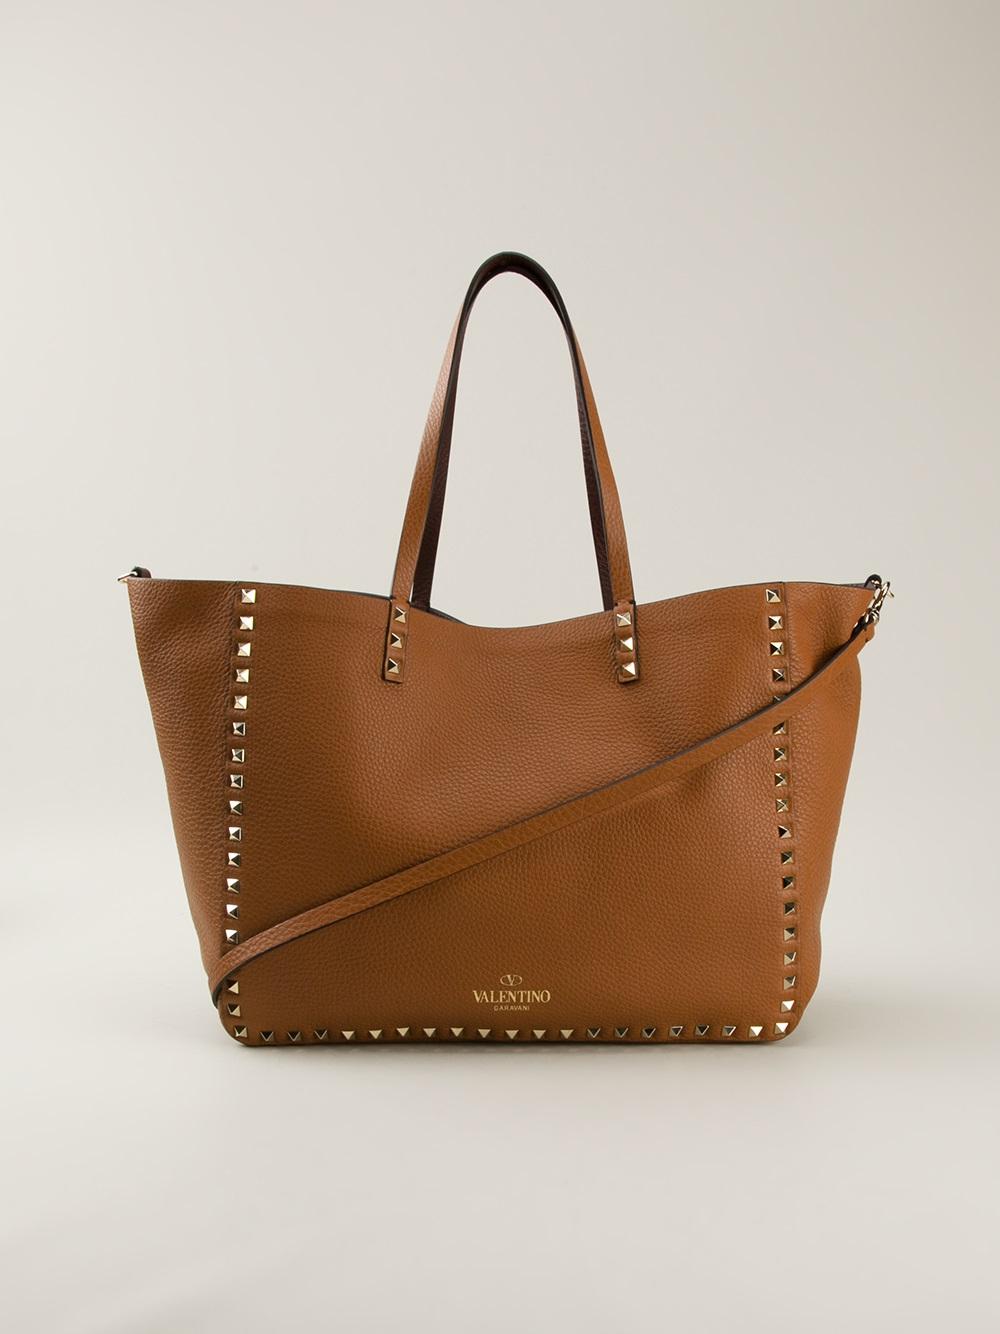 Lyst Valentino Rockstud Shopper Tote In Brown